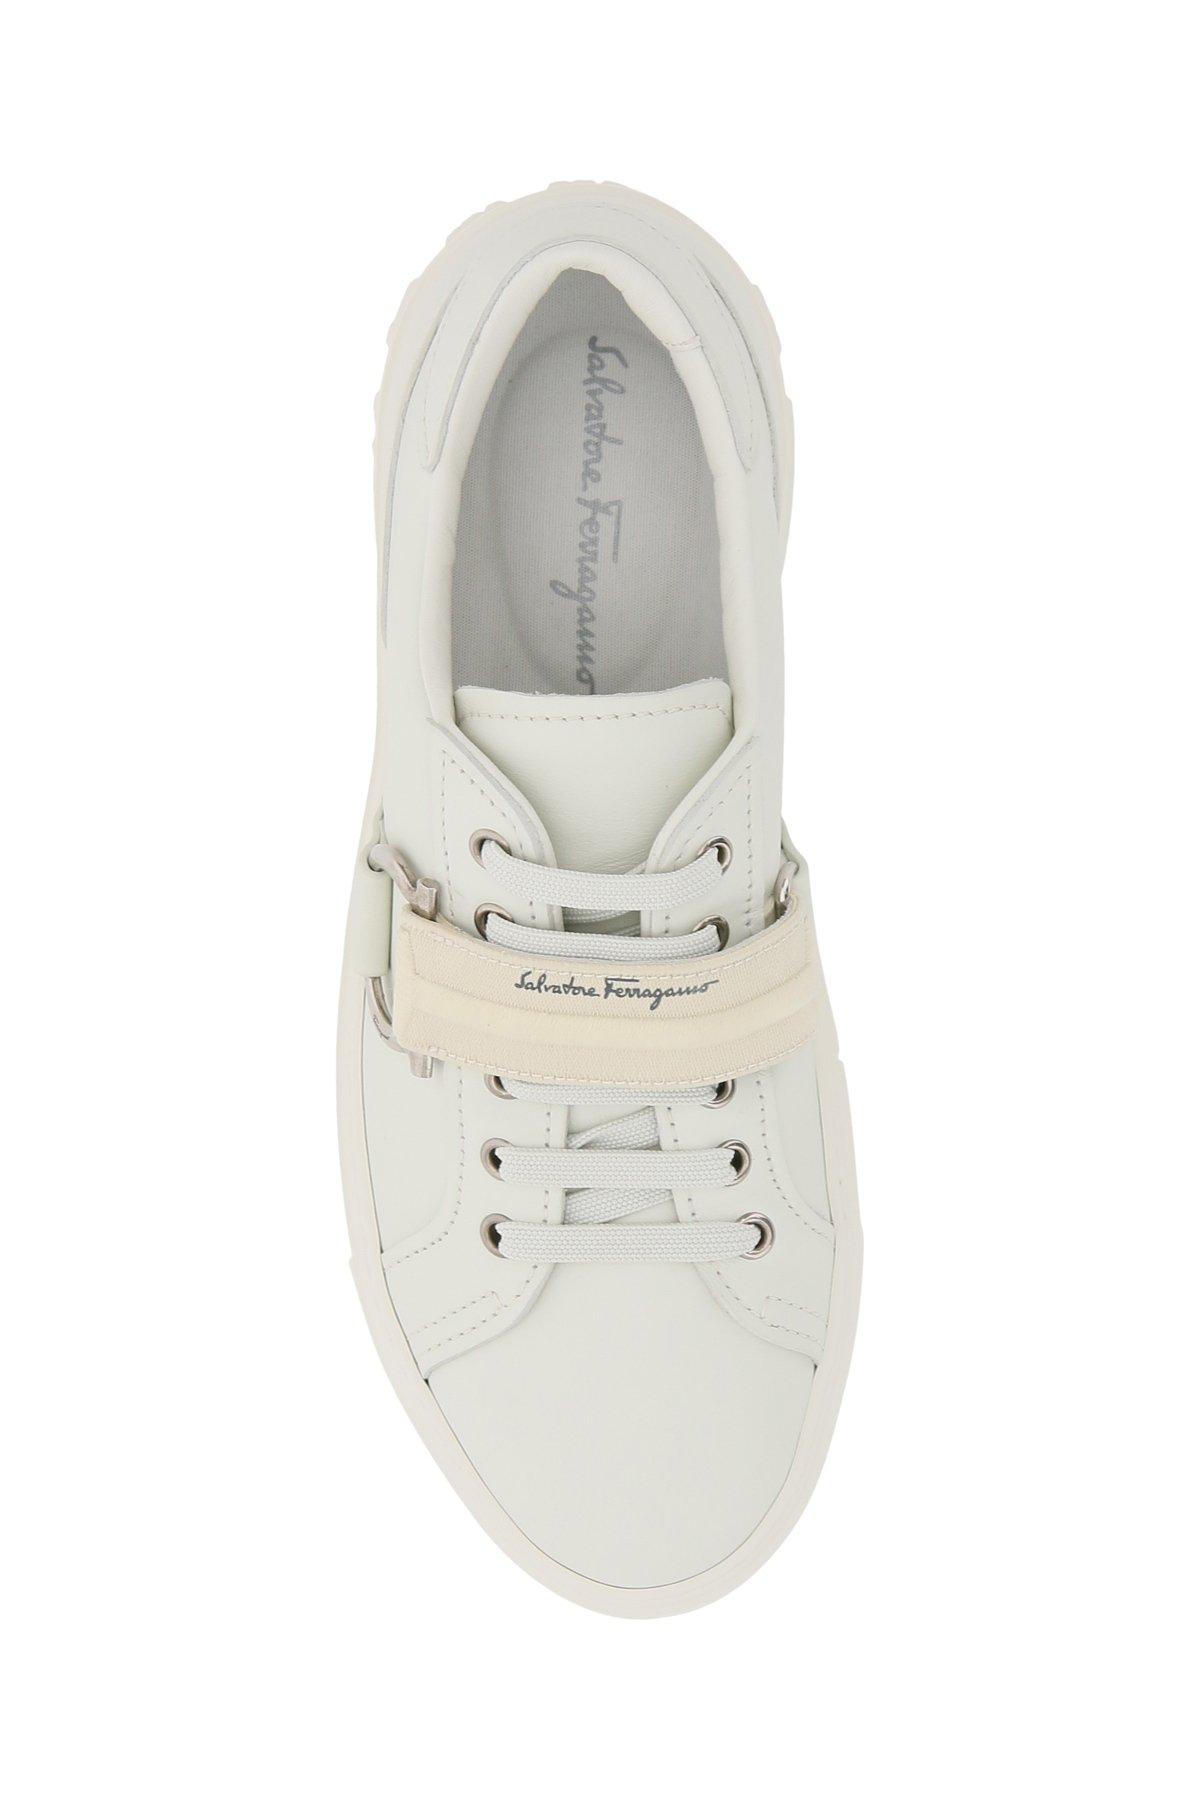 Salvatore ferragamo sneakers in pelle pharrel